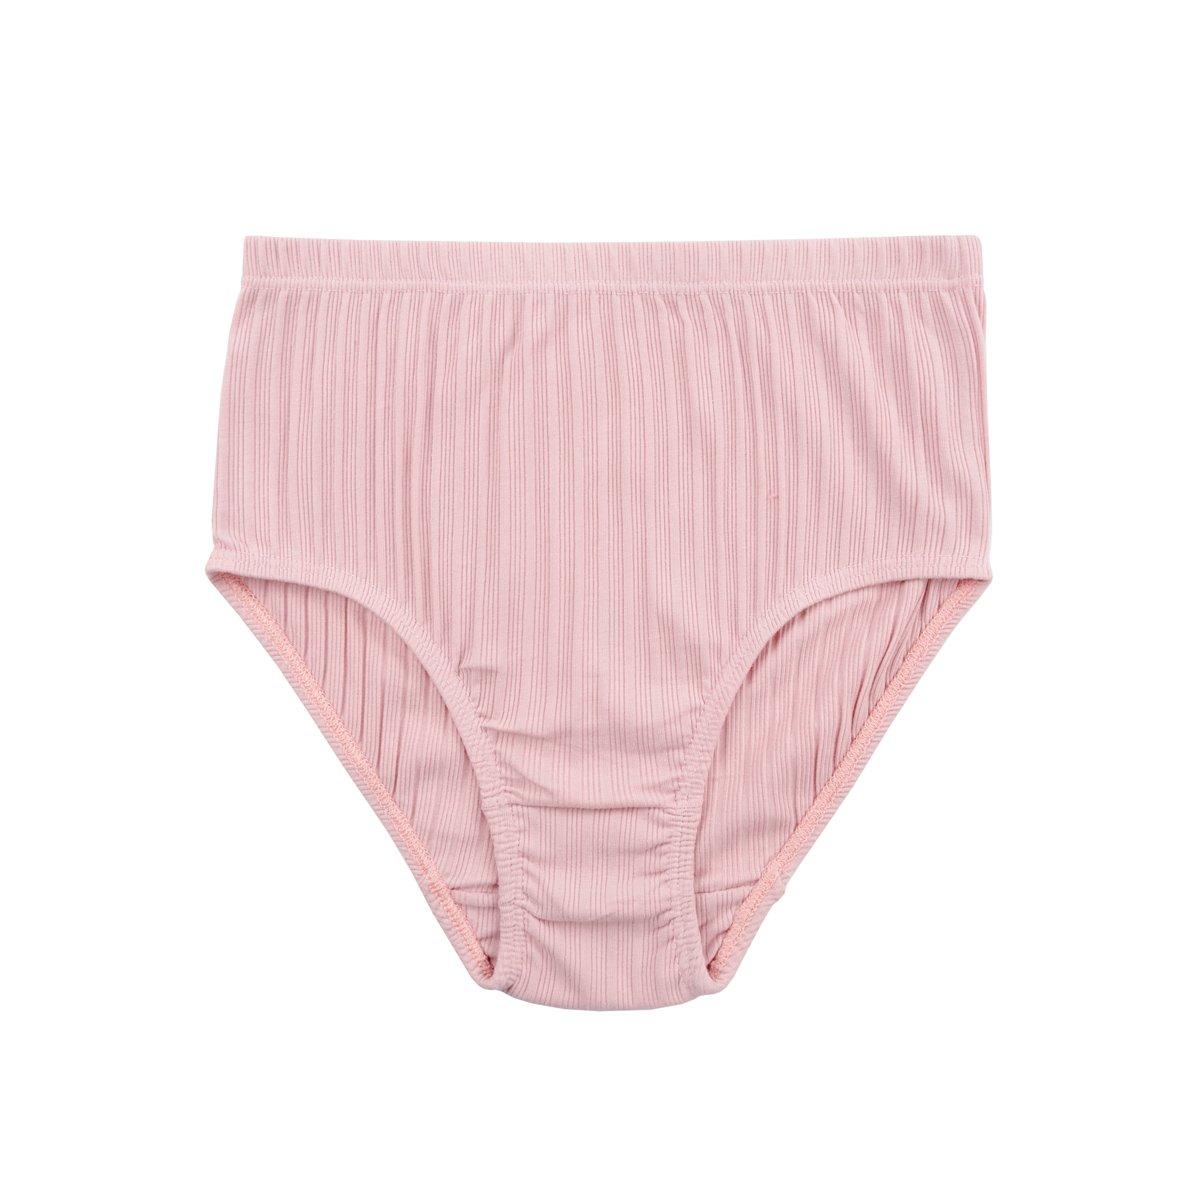 b6d408d2e98 Knitlord Women's Plus Size Underwear Cotton 6 Pack Comfort Briefs Panties  at Amazon Women's Clothing store: